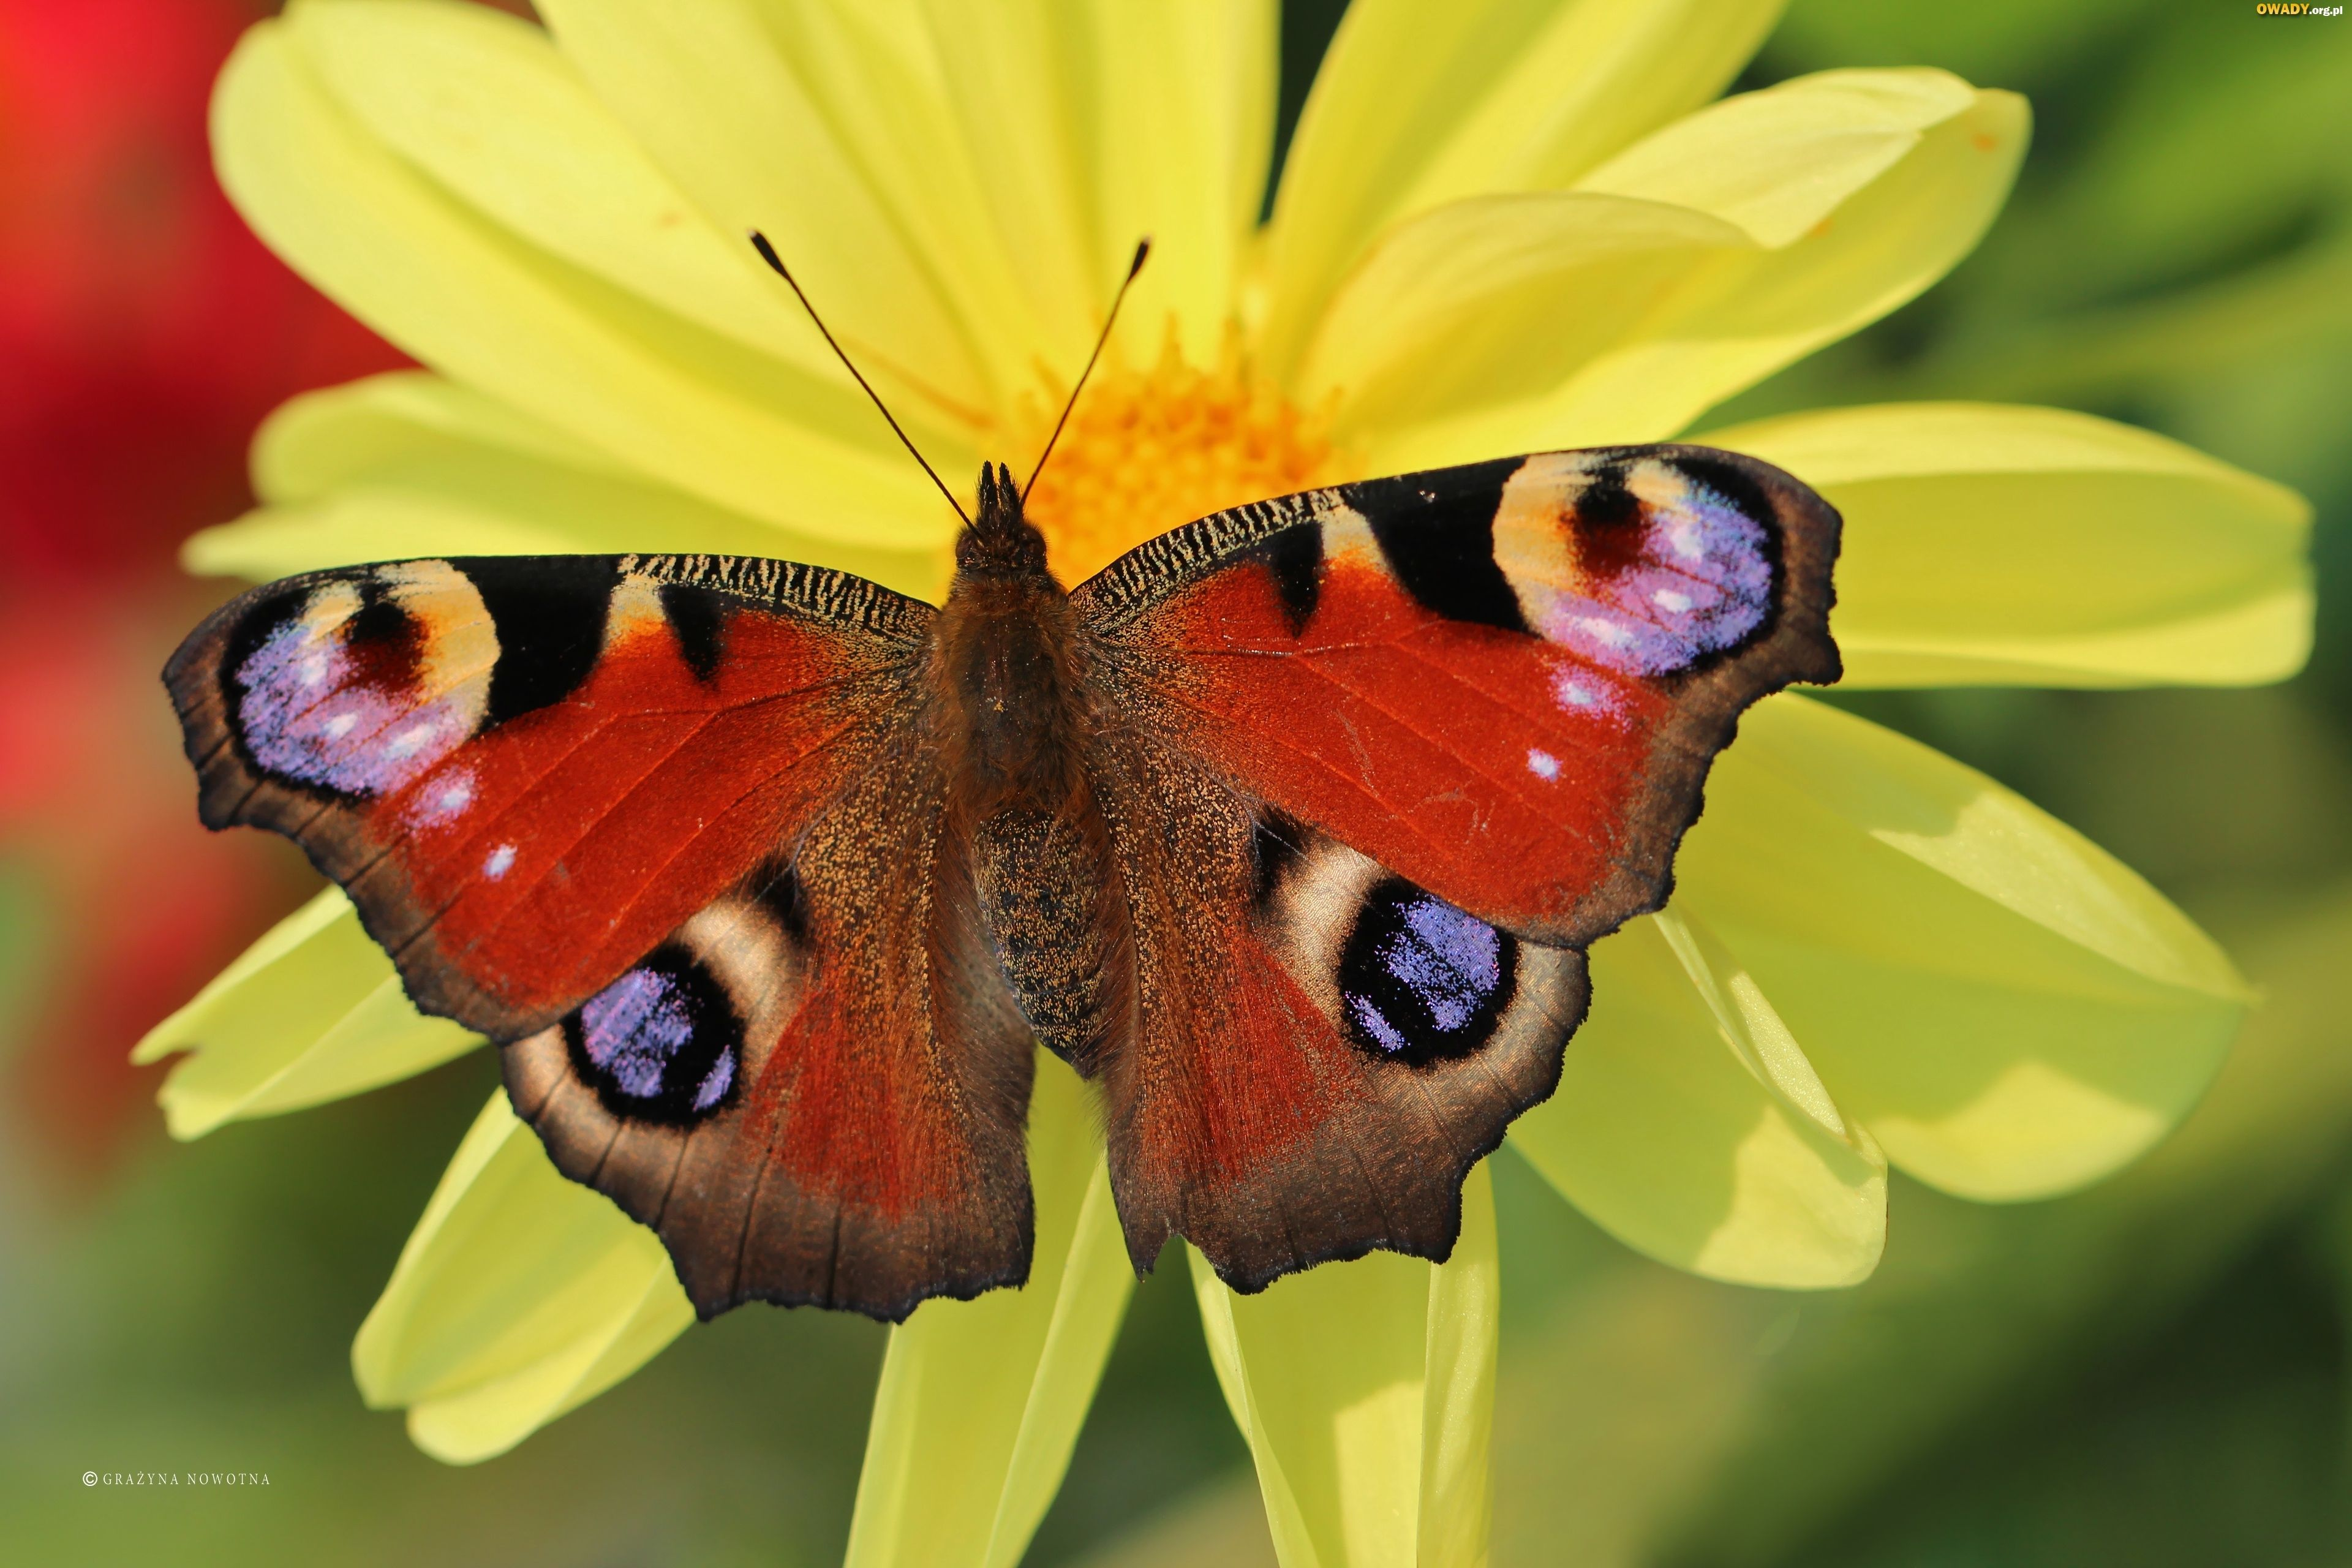 Motyl, Pawik Rusałka, Dalia, Kwiat